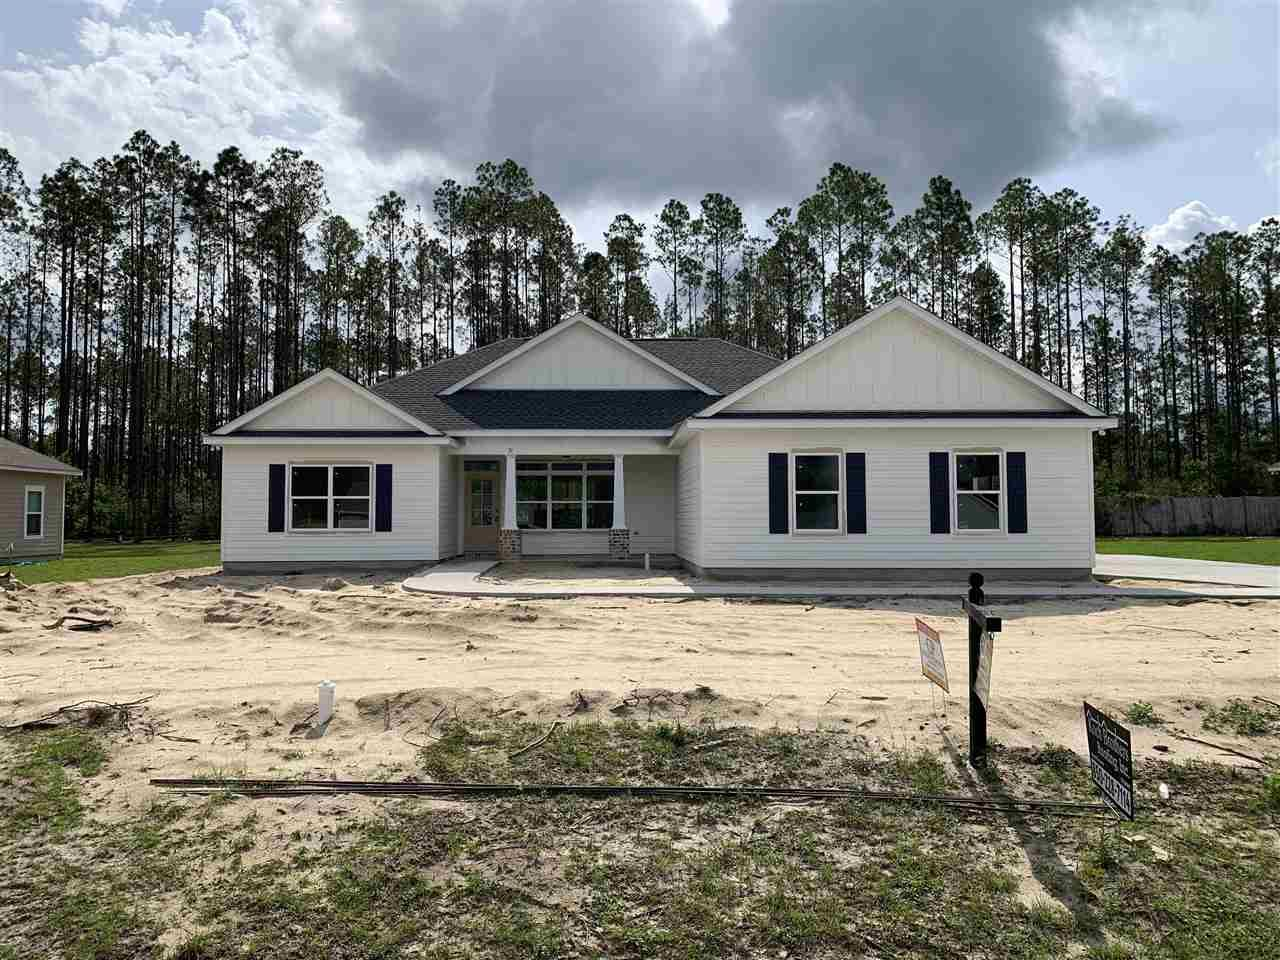 31 Conifer Court, Crawfordville, FL 32327 - MLS#: 314695